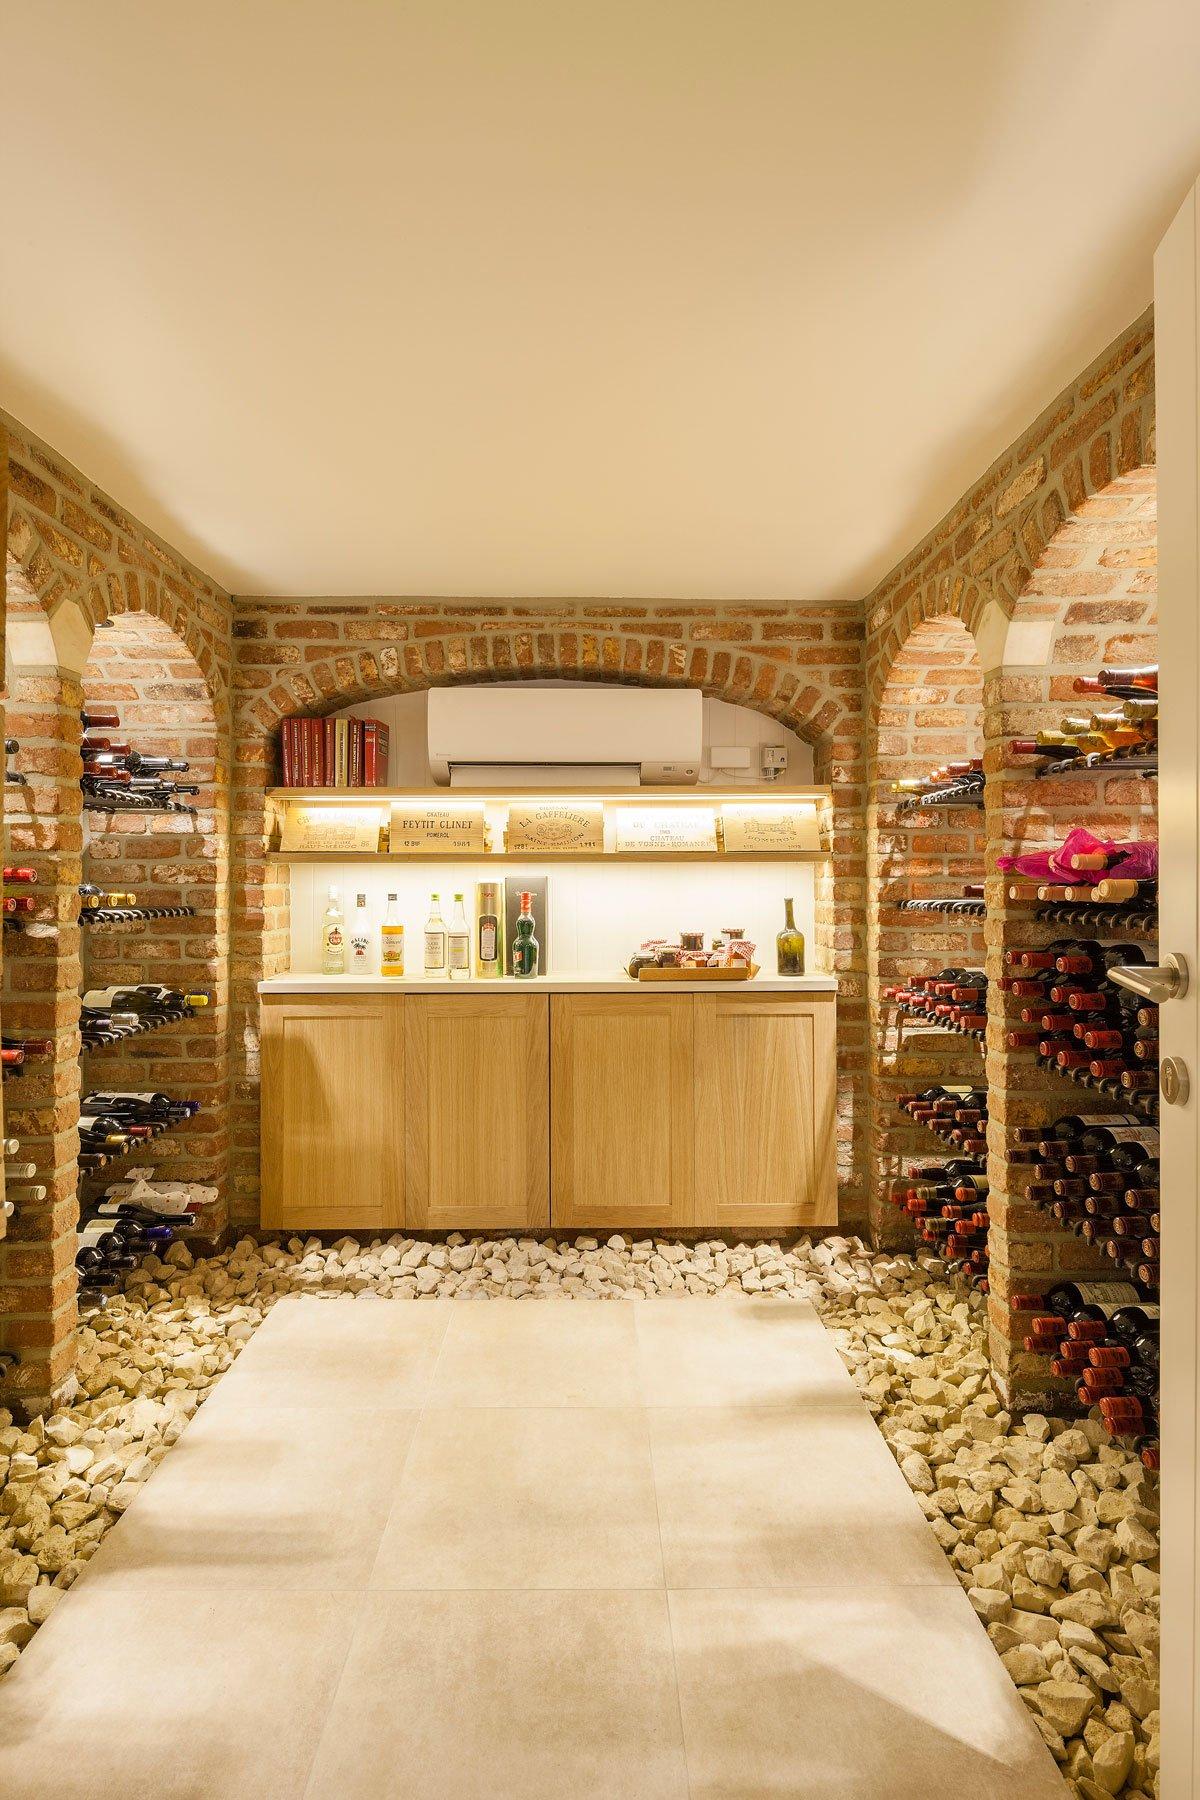 Kelder, wijnkelder, klassiek, Amerikaanse stijl, b+ villas